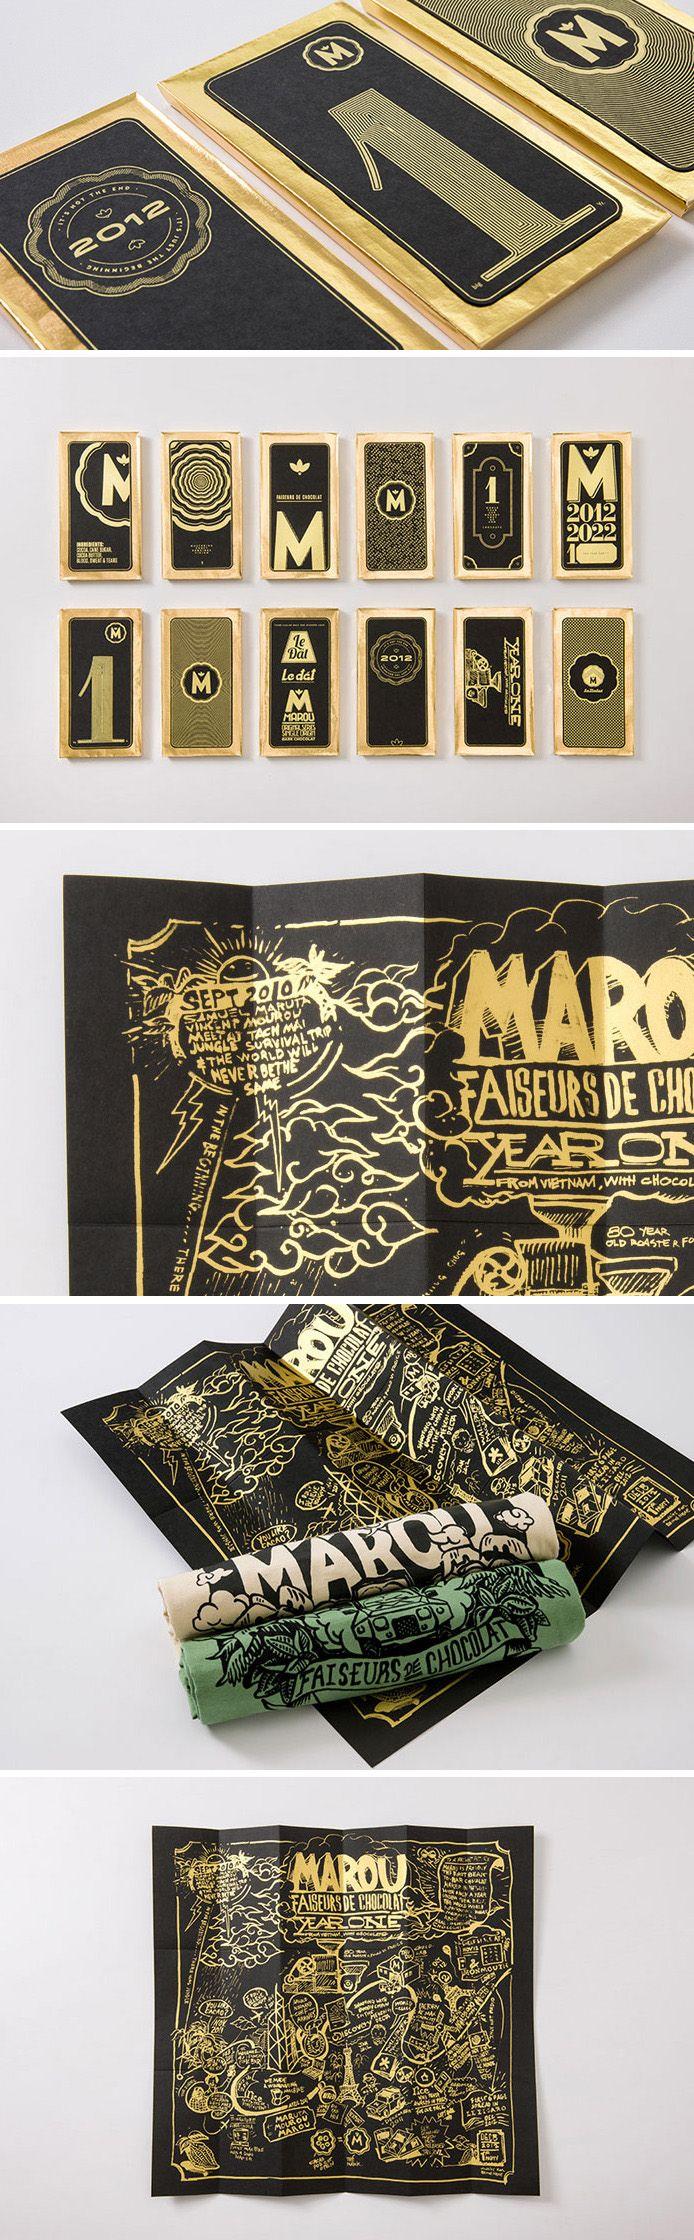 Marou Faiseurs de Chocolat Year 1